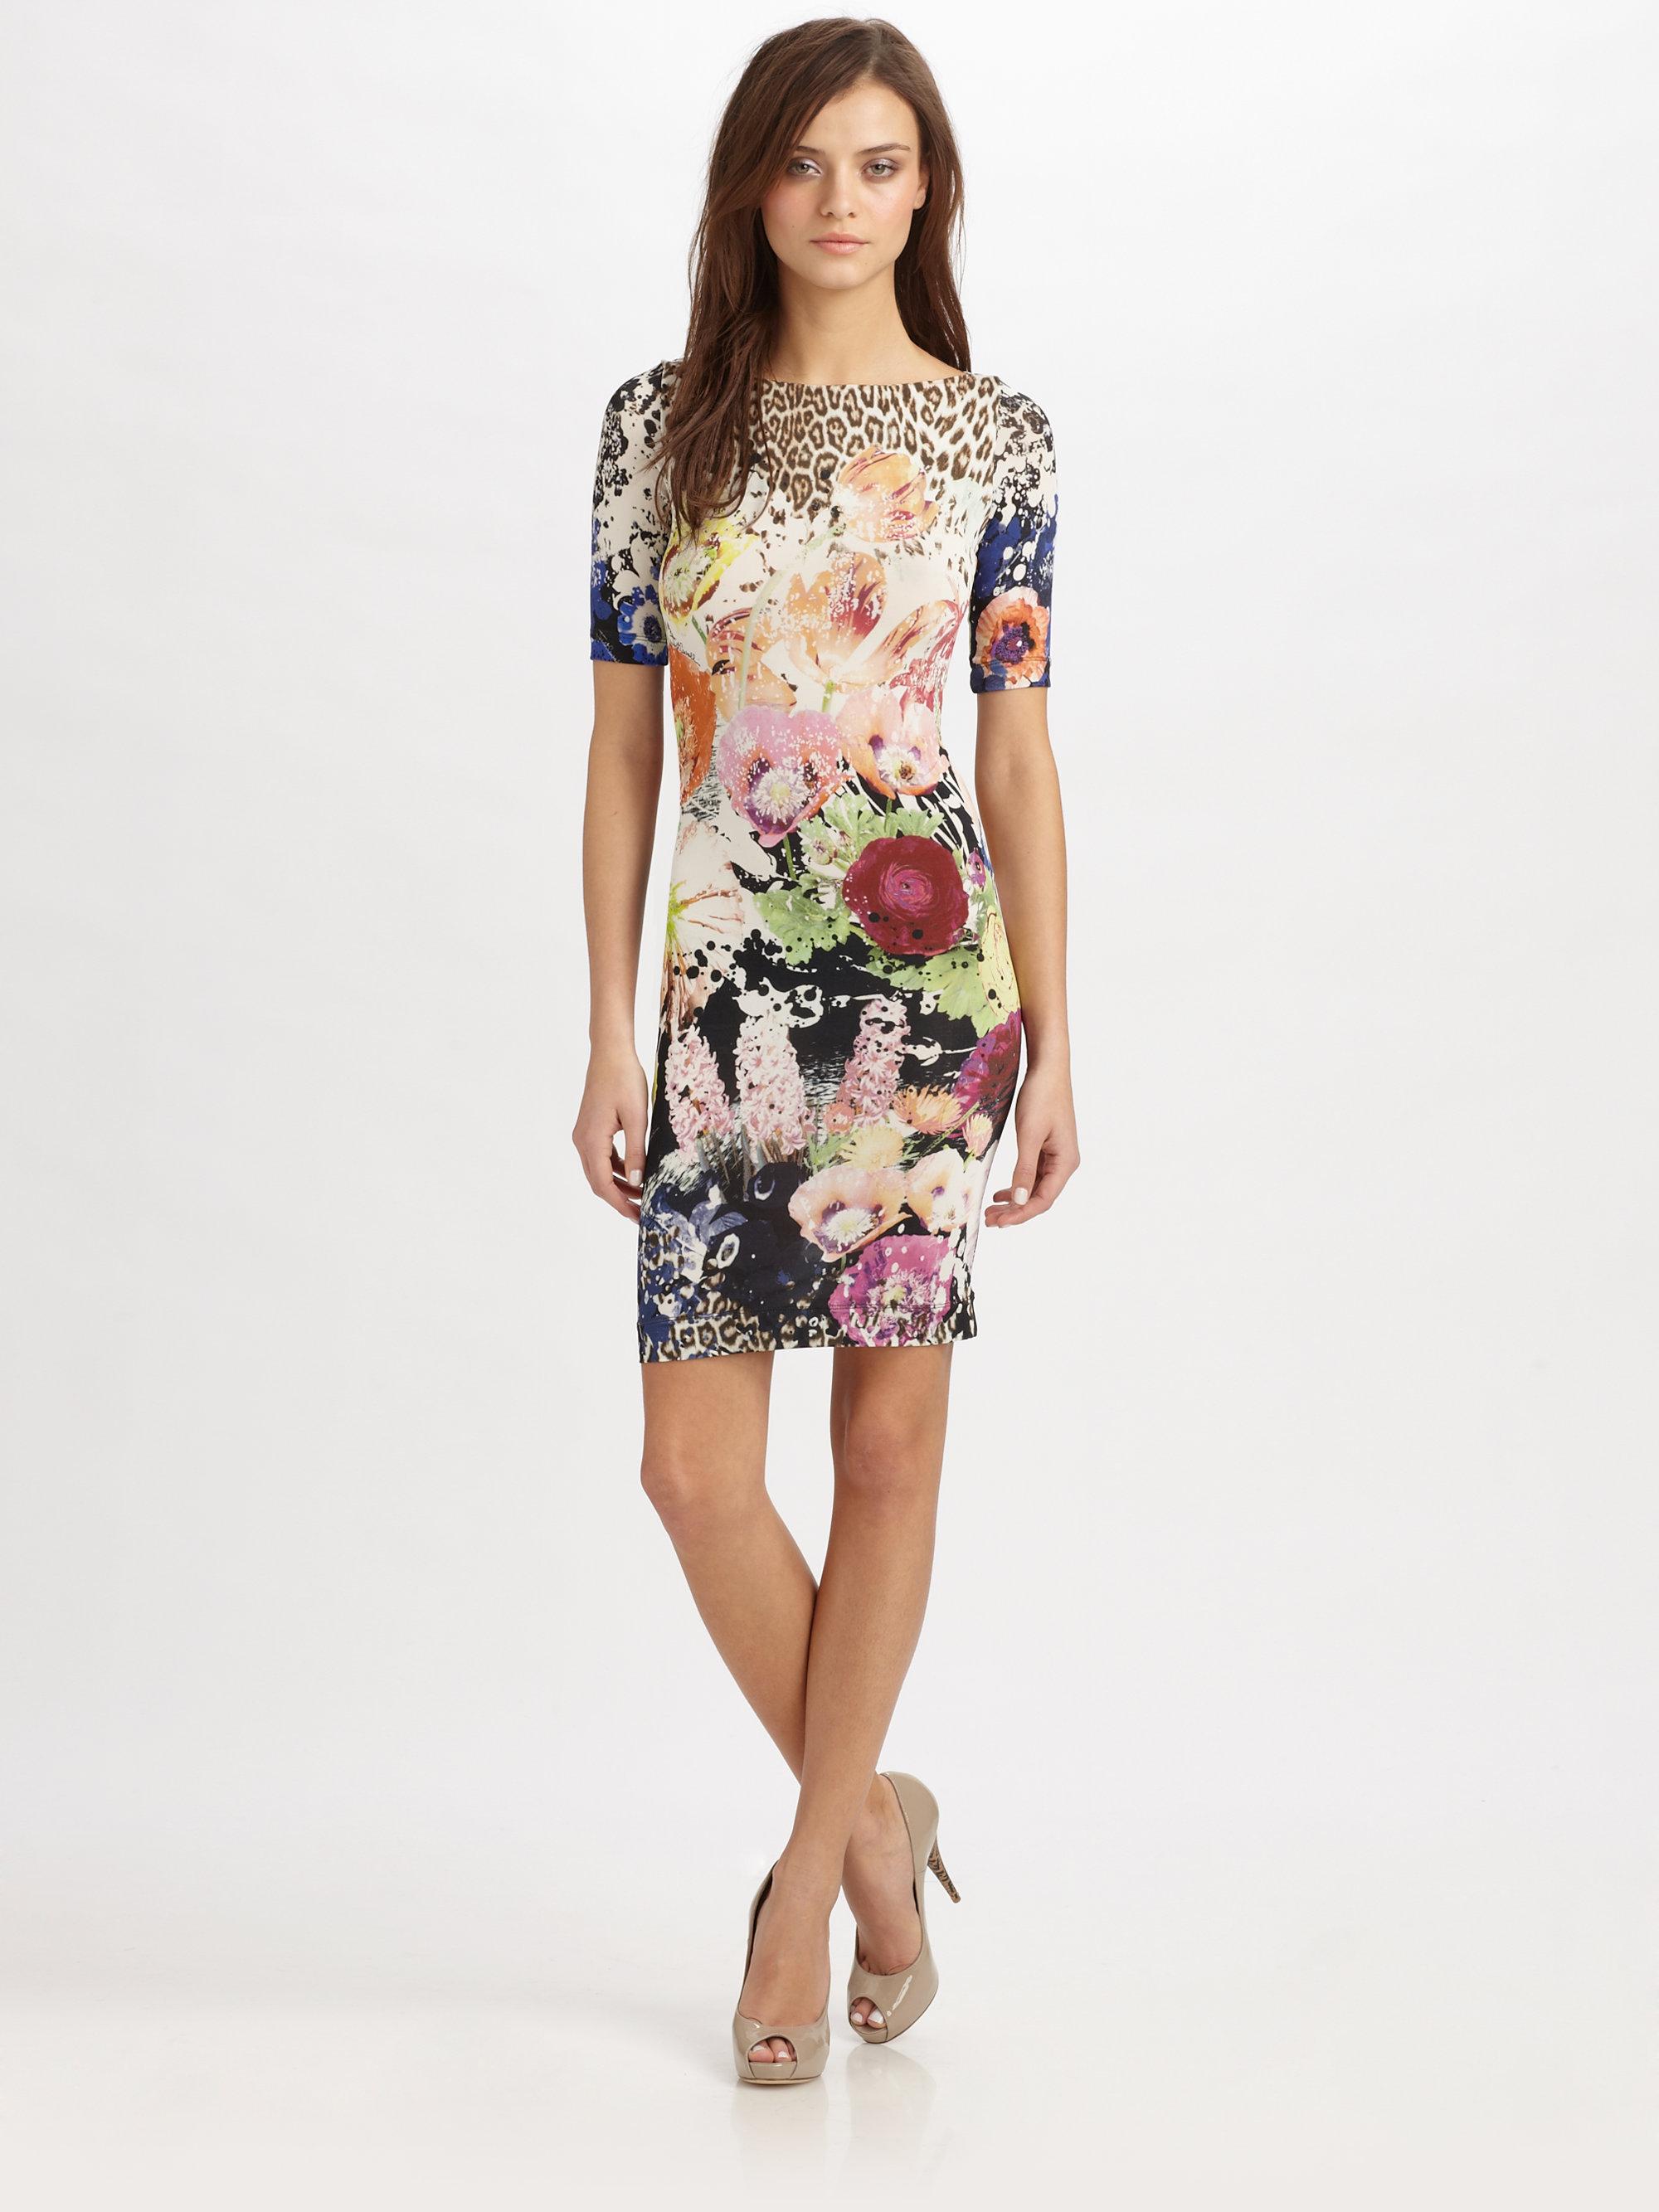 2017 05 fashion jersey dress - 2017 05 Fashion Jersey Dress 0